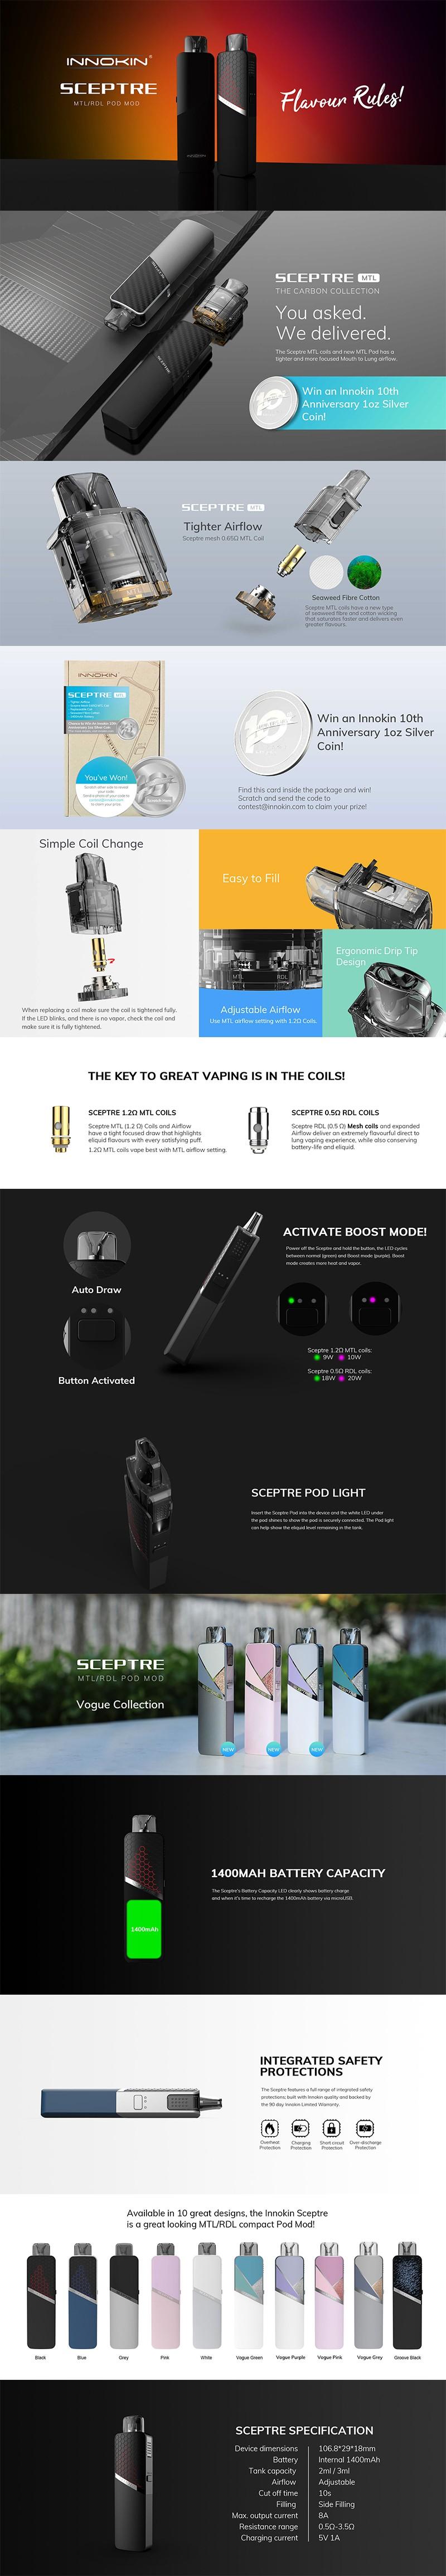 Authentic Innokin Sceptre 1400mAh Pod System Mod Vape Starter Kit